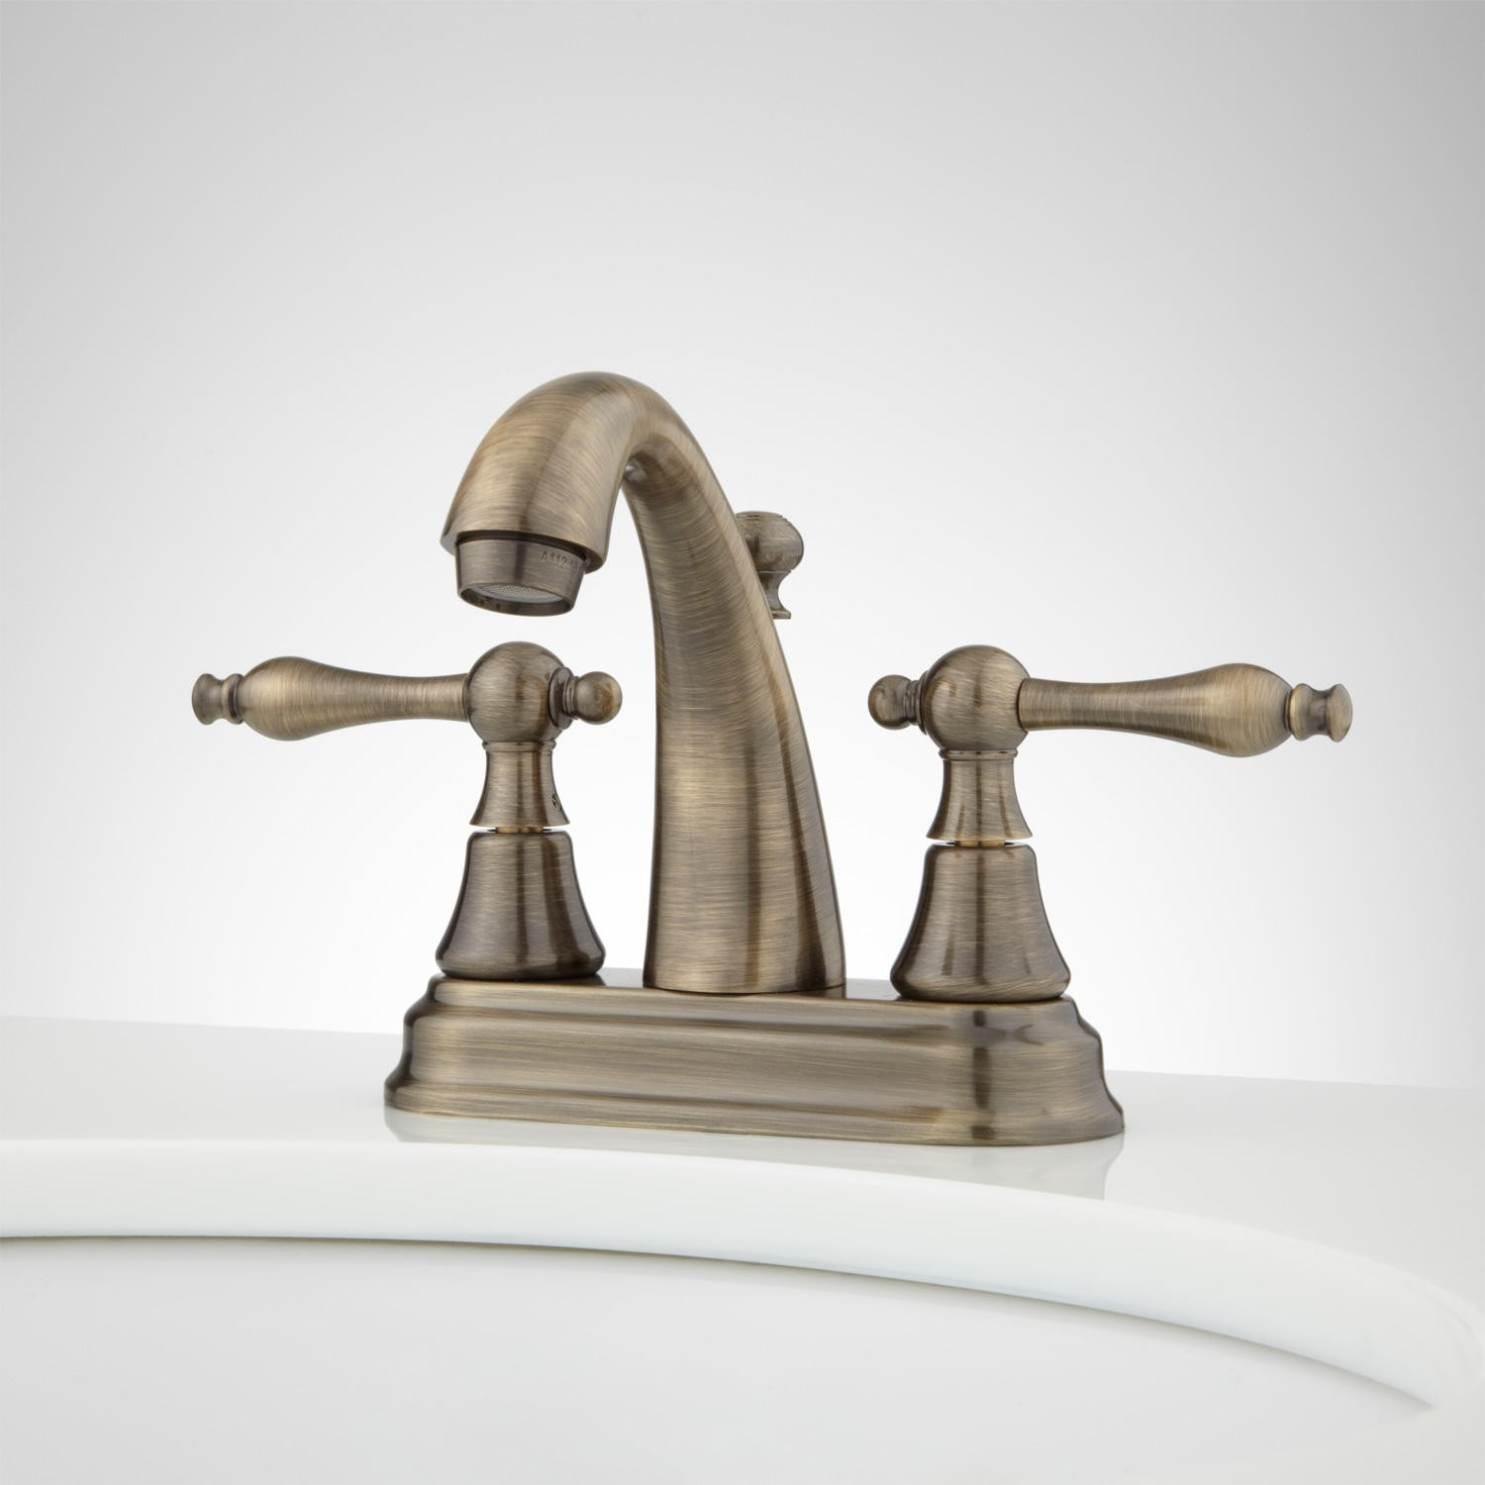 Ideas, antique brass bathroom faucets fixtures antique brass bathroom faucets fixtures easy tips to revamp antique brass bathroom faucet ideas free 1485 x 1485  .